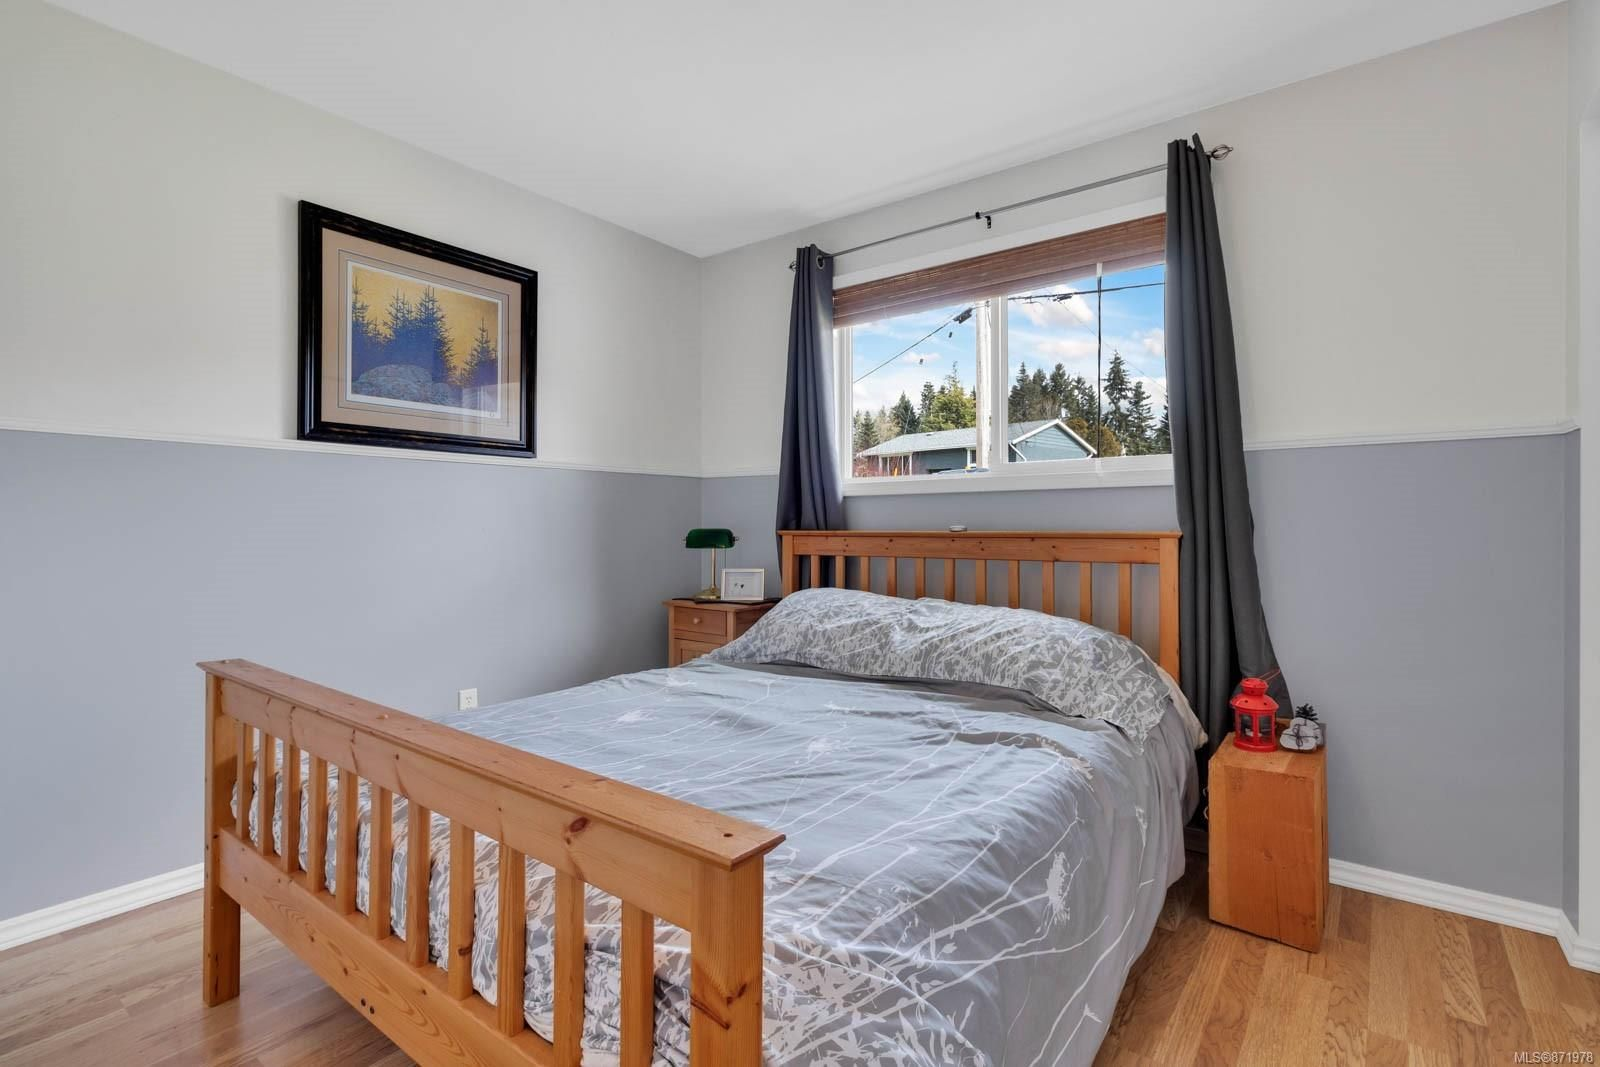 Photo 16: Photos: 1539 Chilcotin Cres in : CV Comox (Town of) House for sale (Comox Valley)  : MLS®# 871978